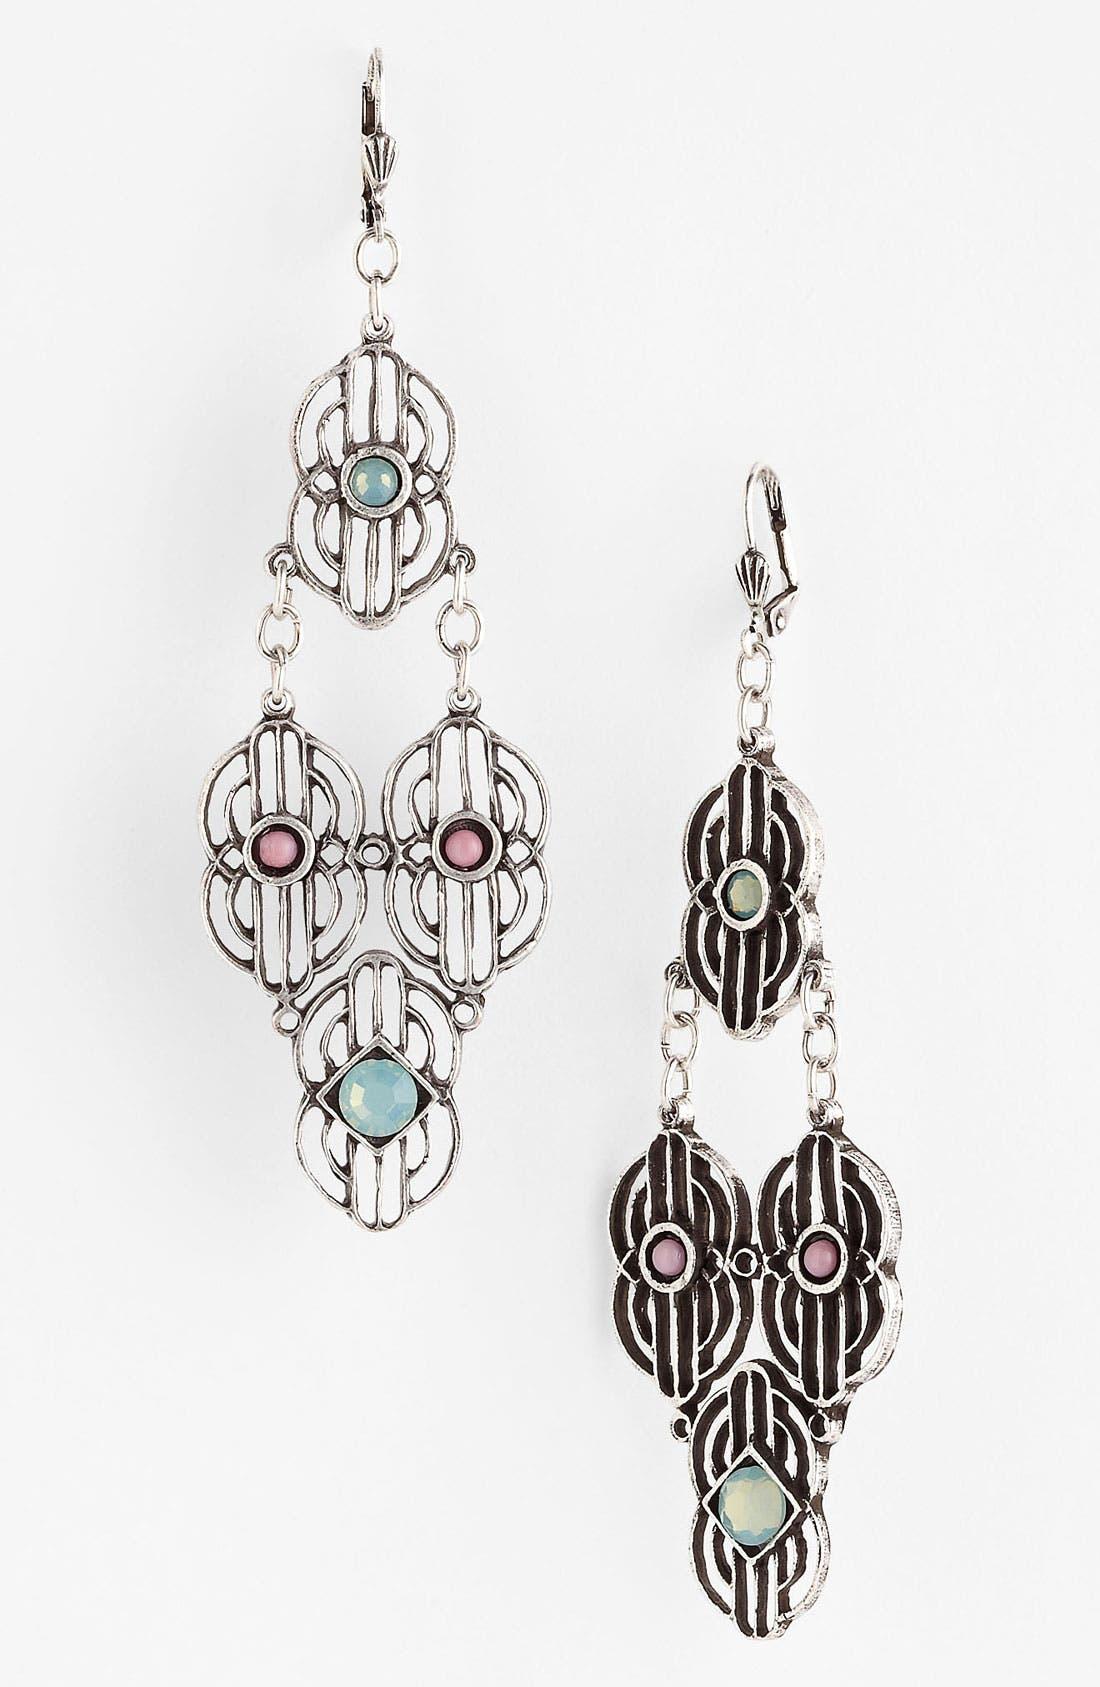 Alternate Image 1 Selected - Bonnie Jonas 'New Deco' Chandelier Earrings